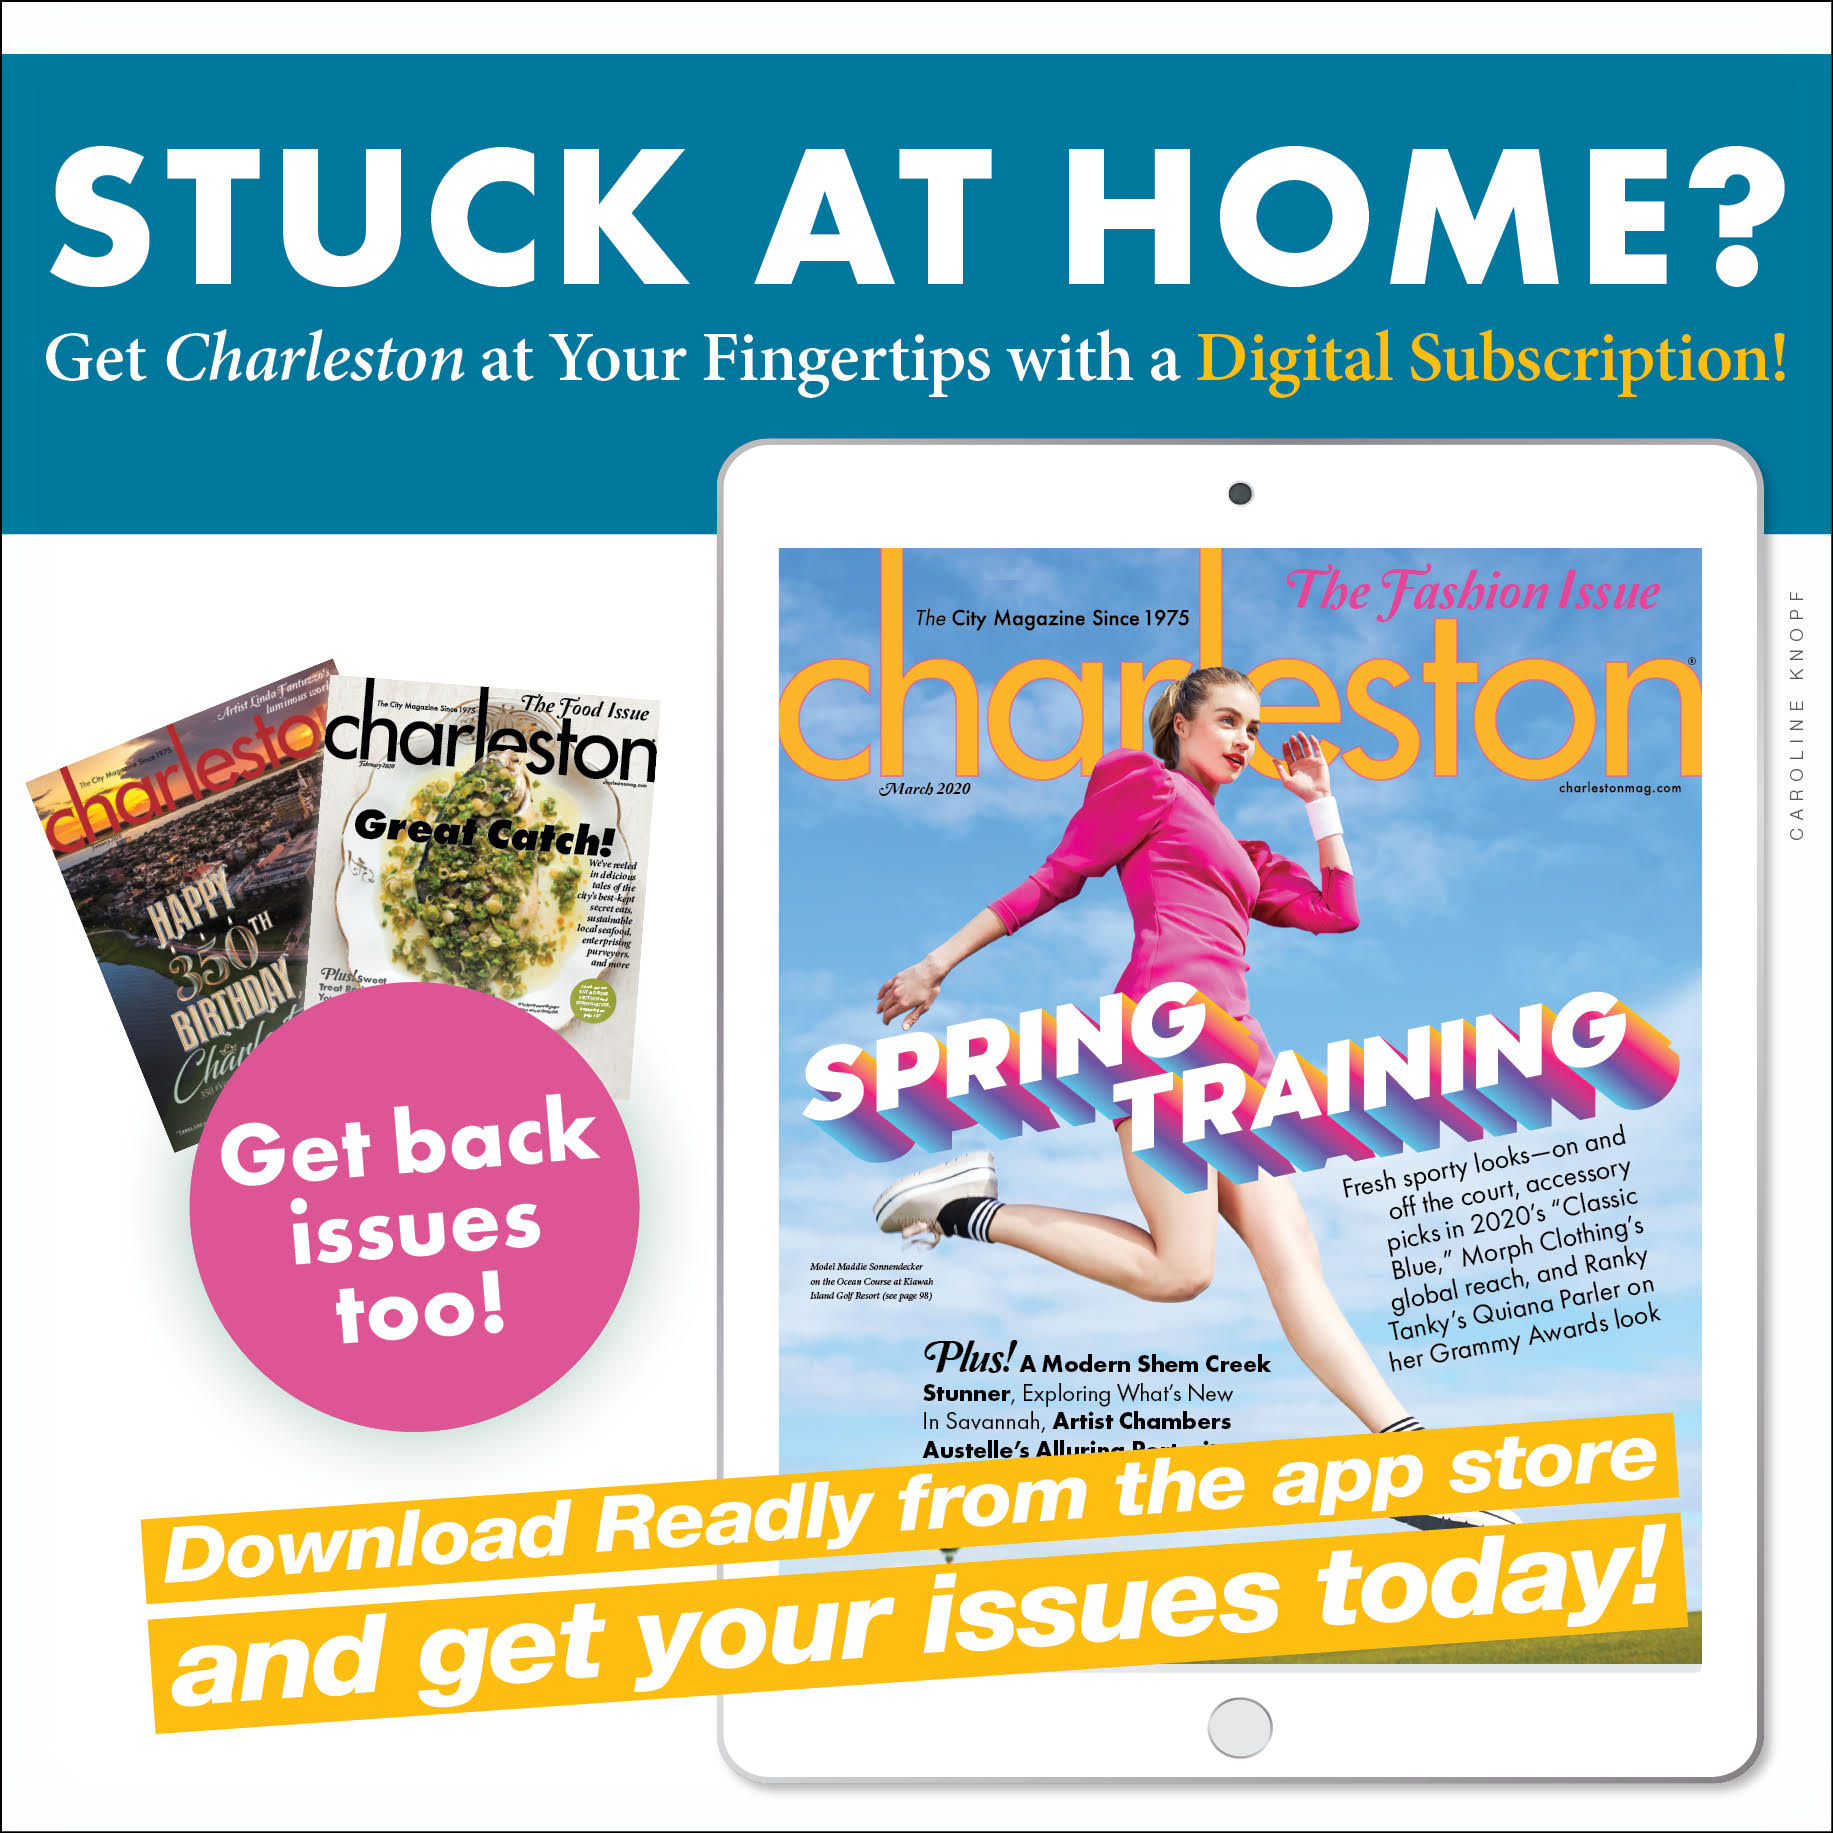 Charleston Magazine on Readly!